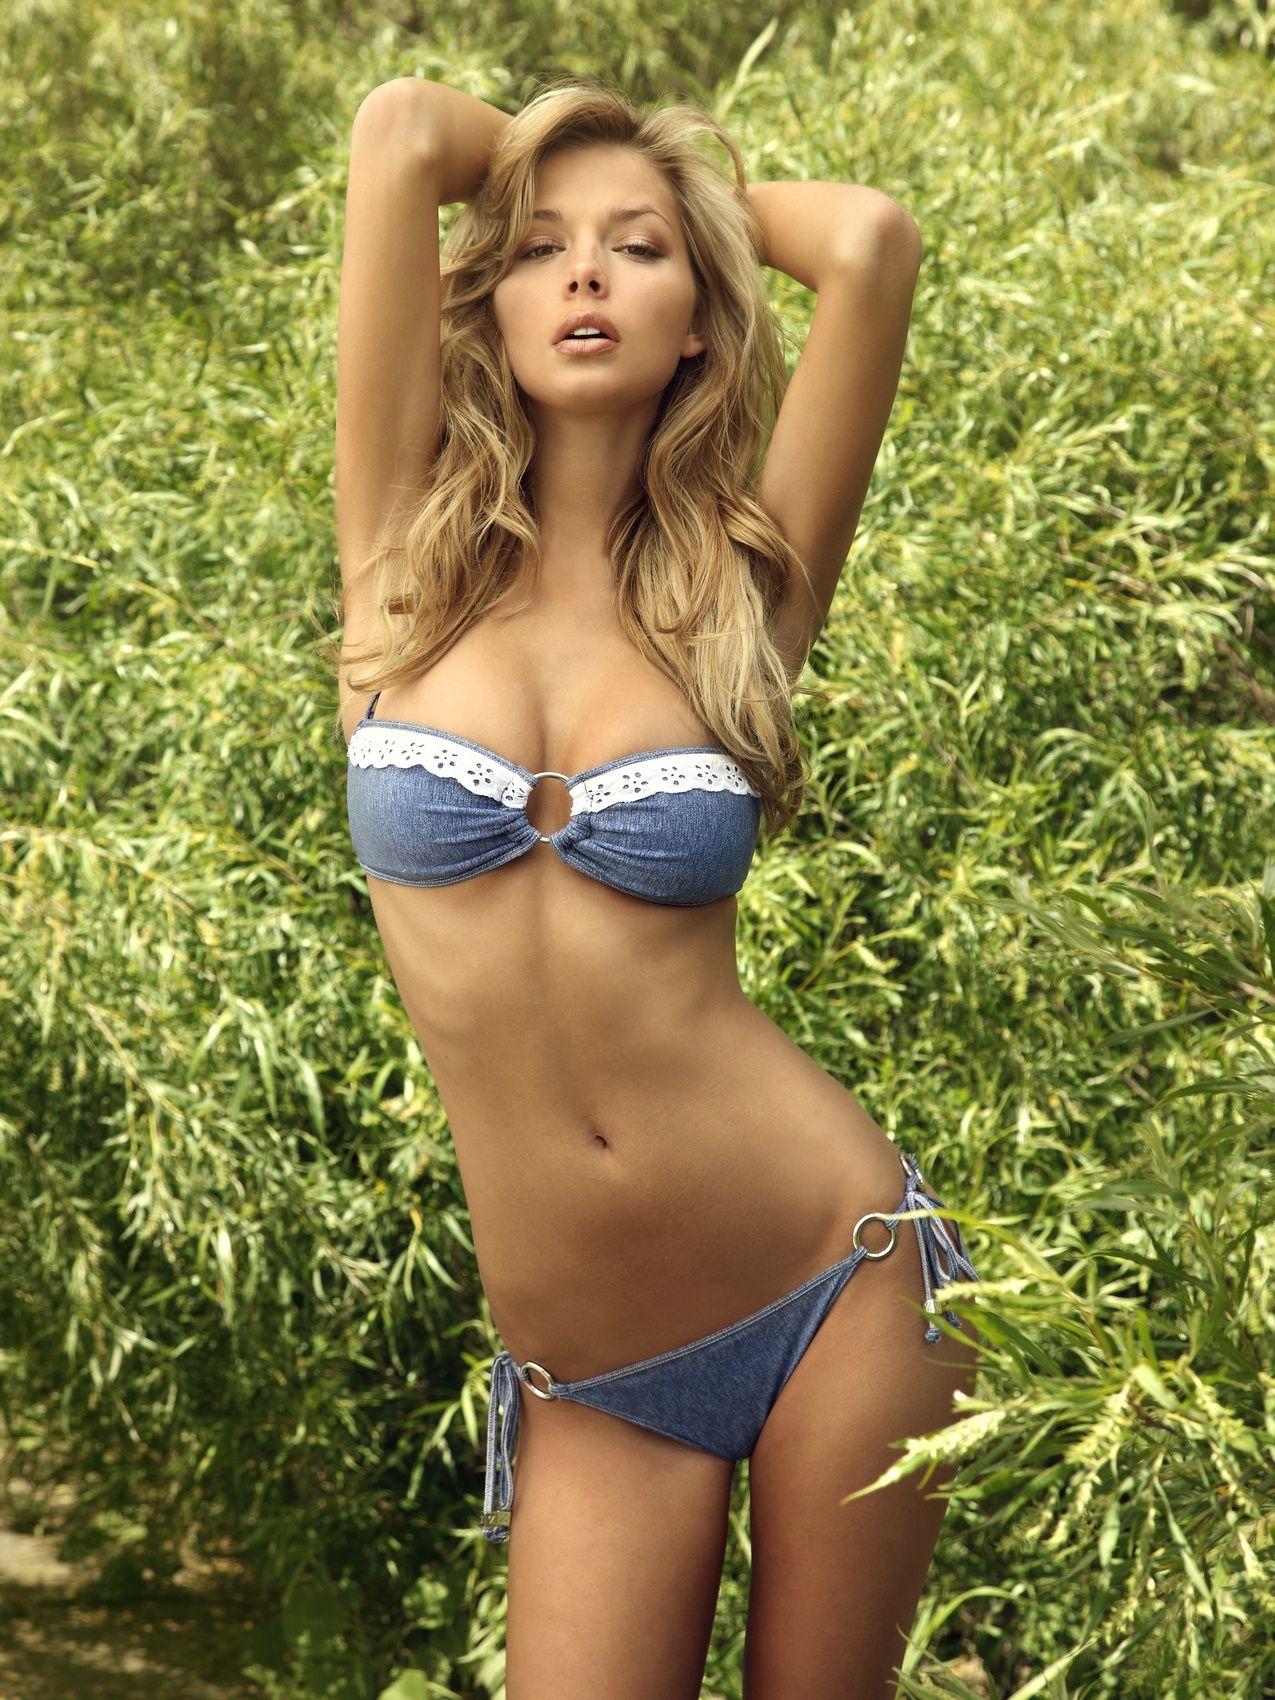 pinhot pics heaven on hottest babes | pinterest